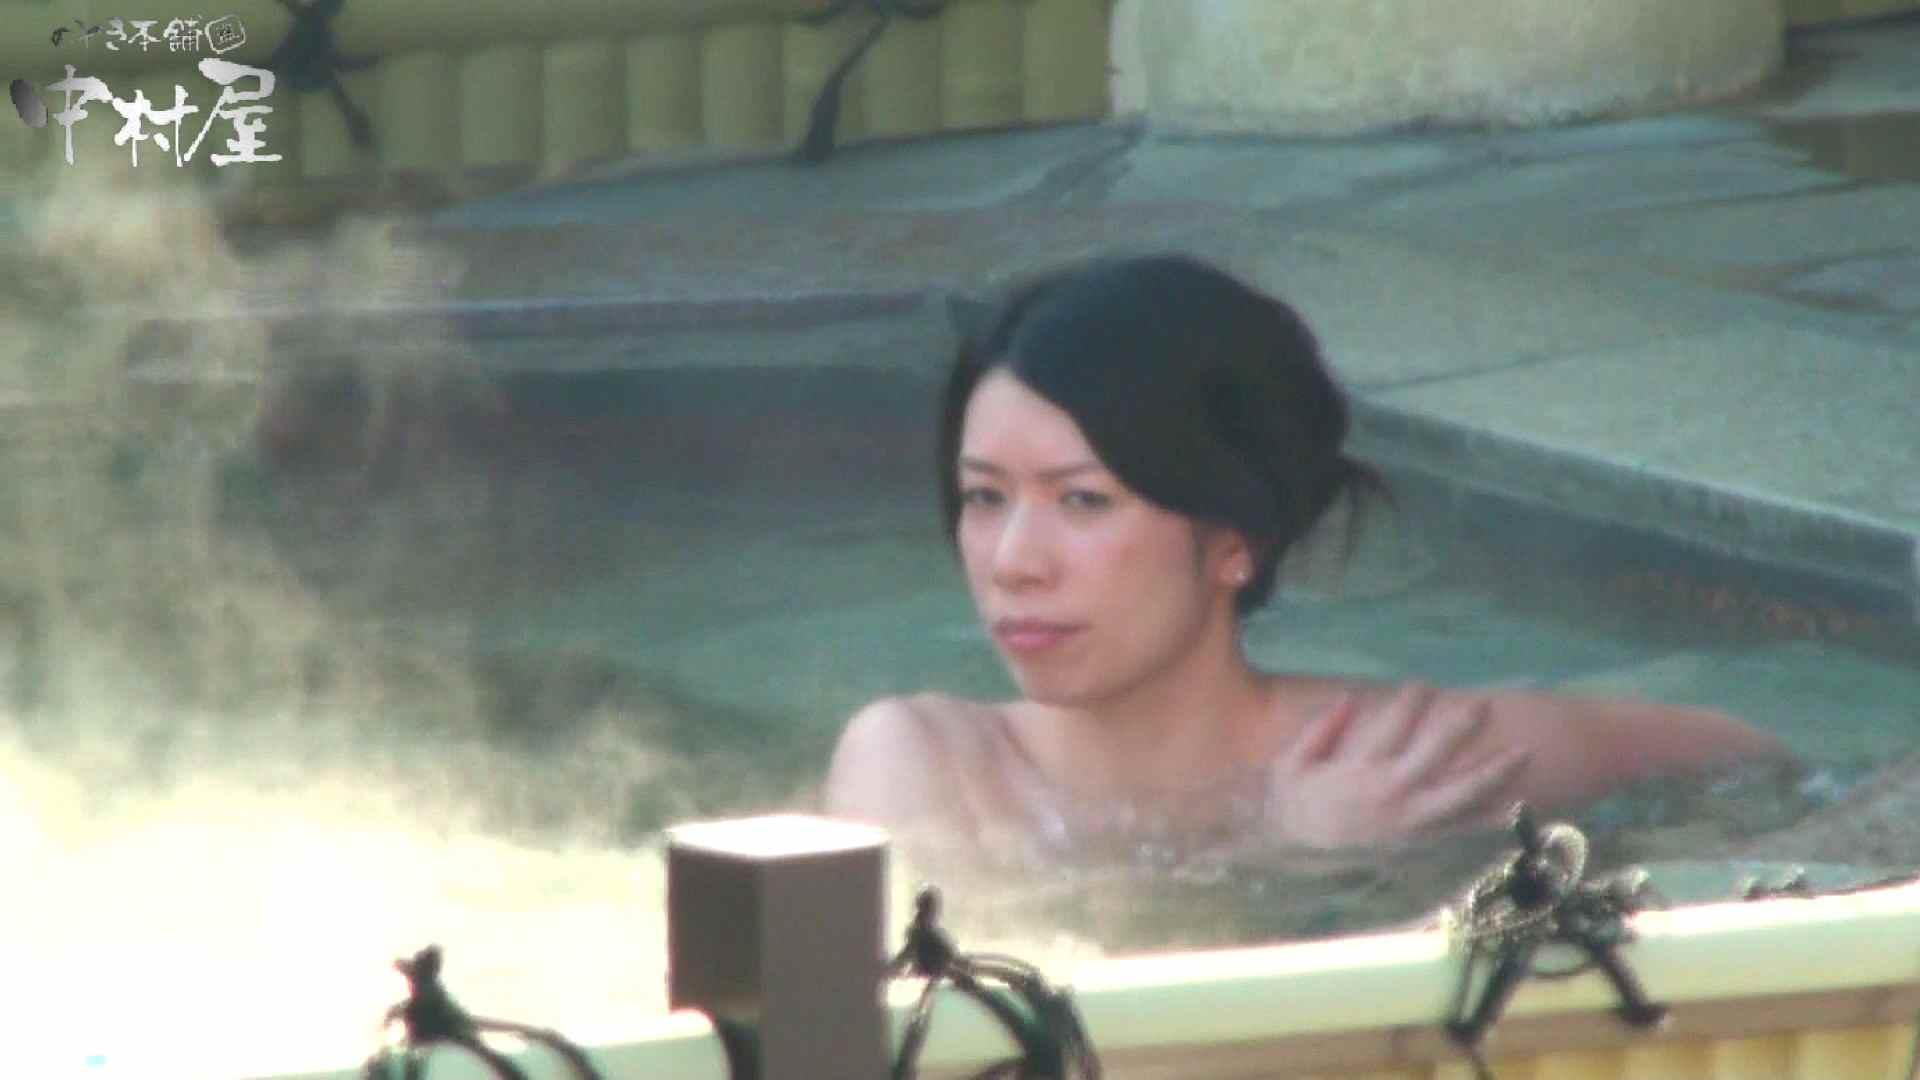 Aquaな露天風呂Vol.919 盗撮 おまんこ無修正動画無料 91連発 56